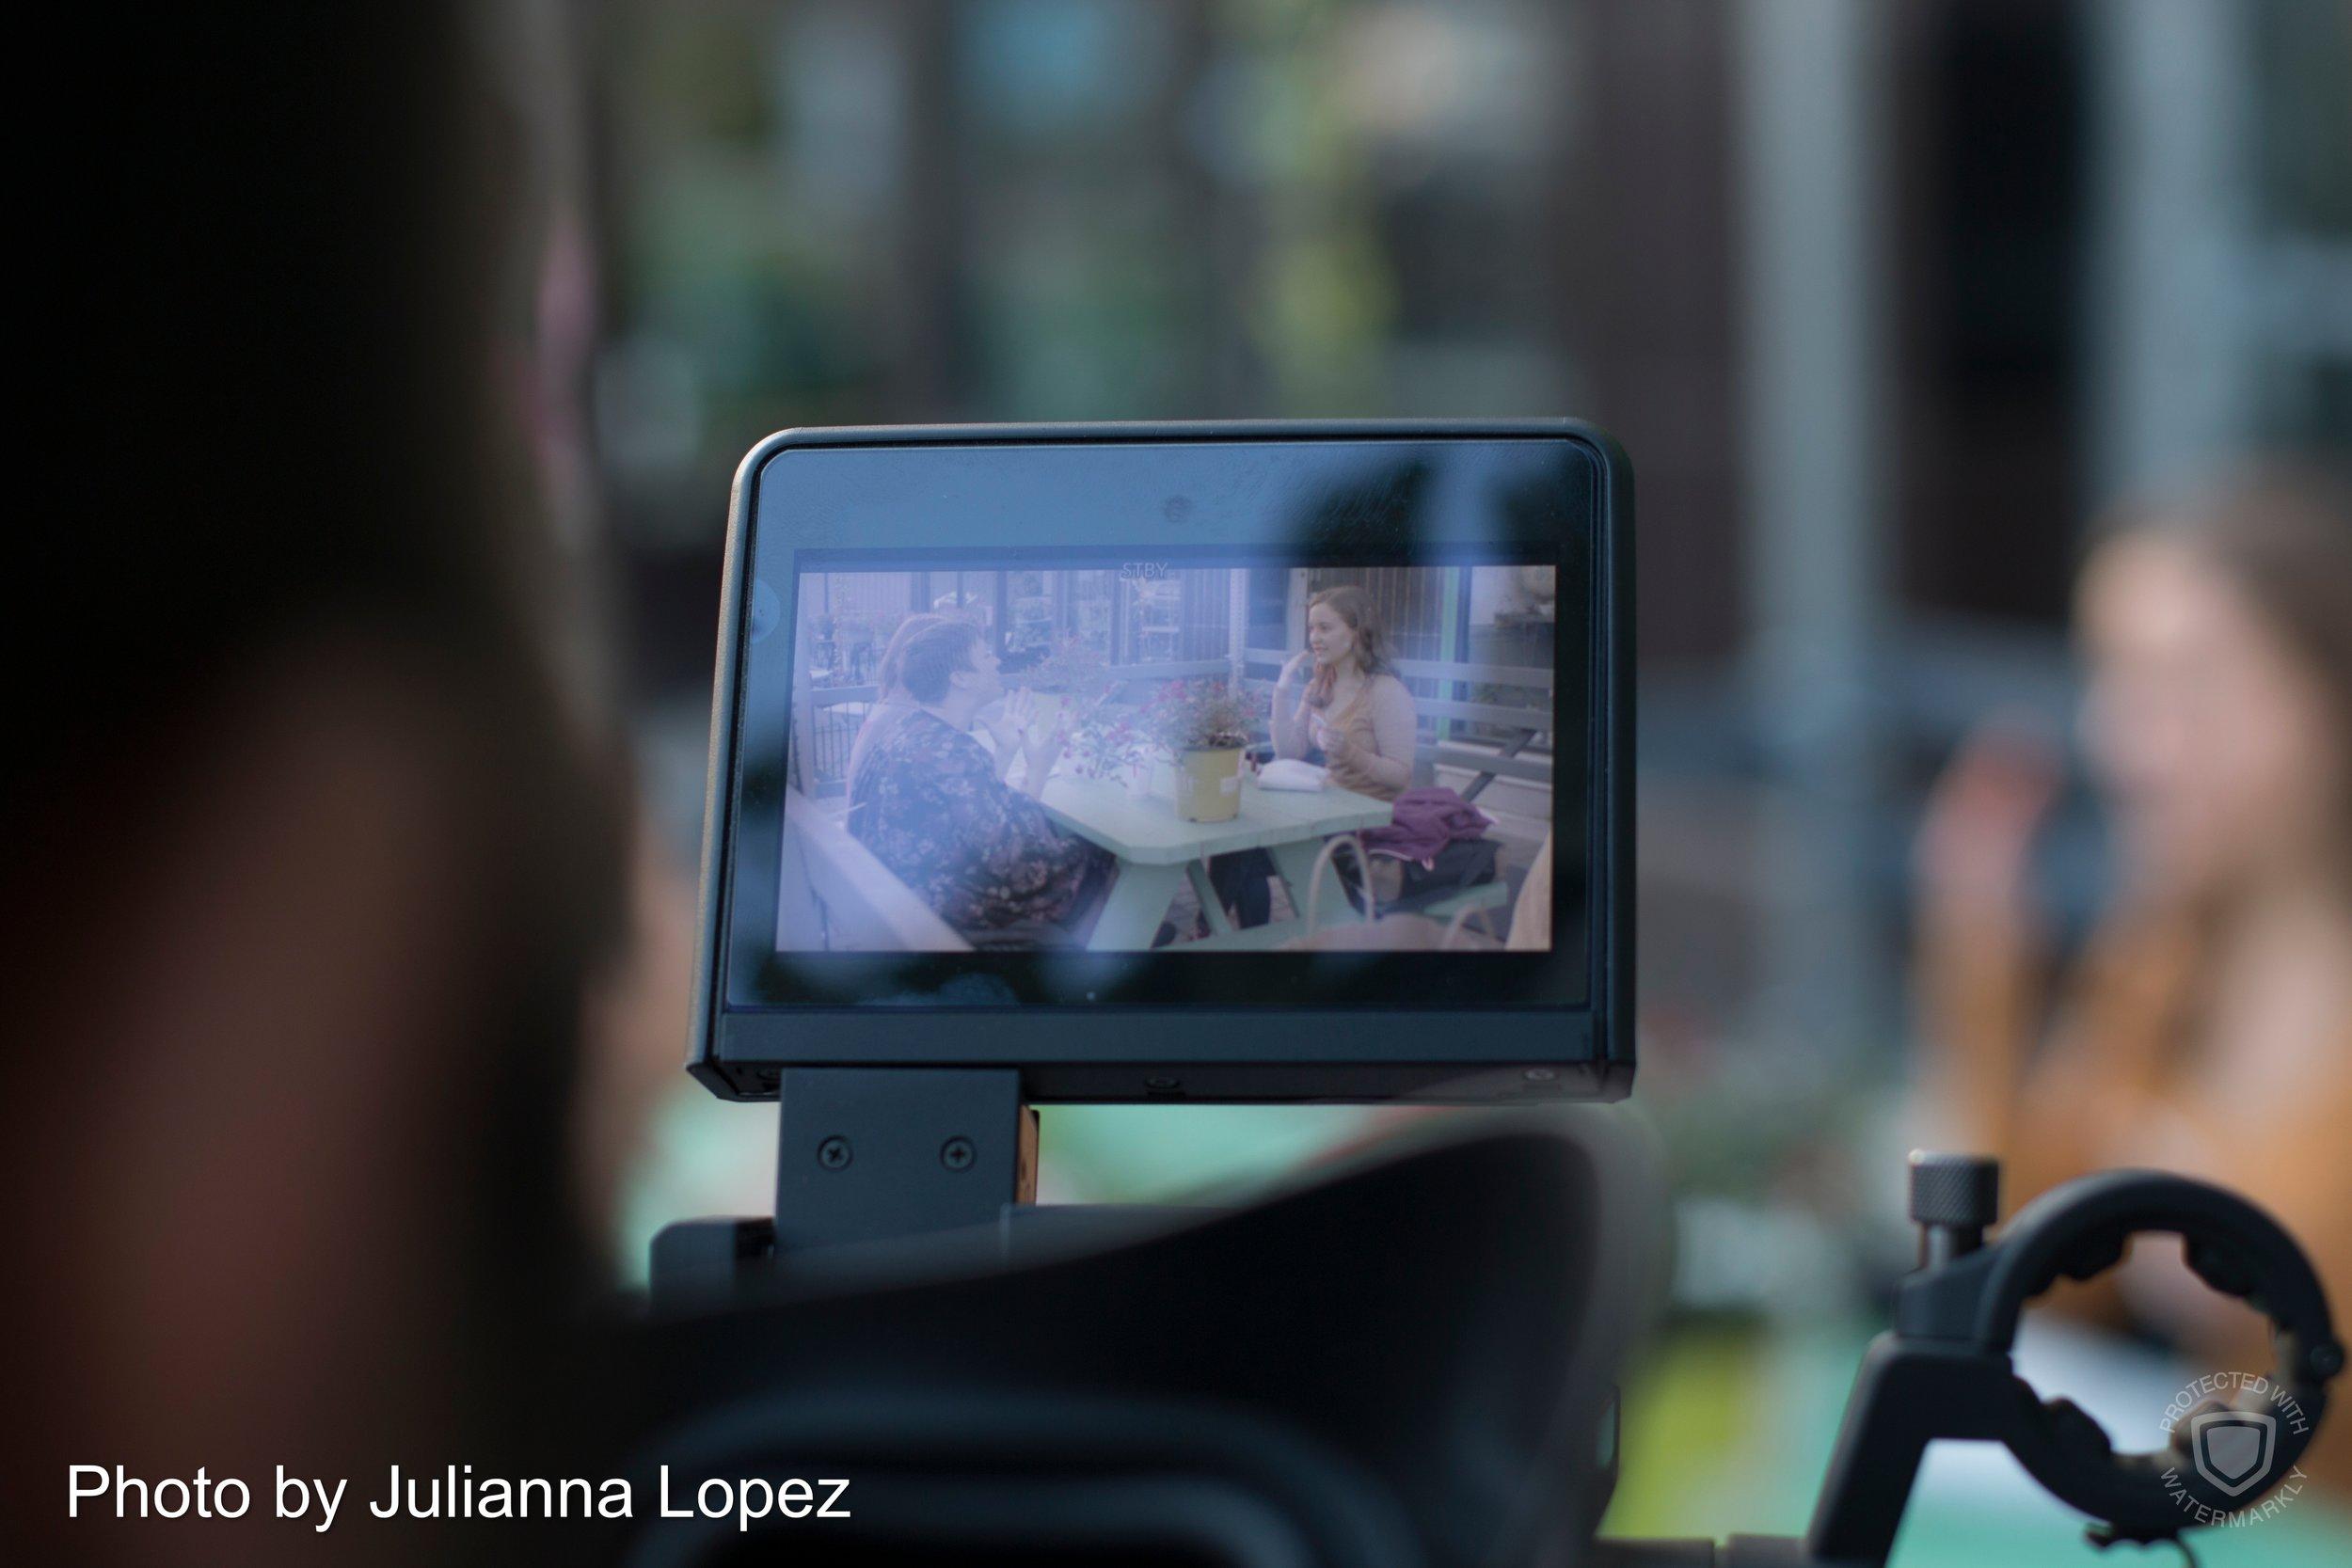 Julianna Lopez - IMG_6386.jpg